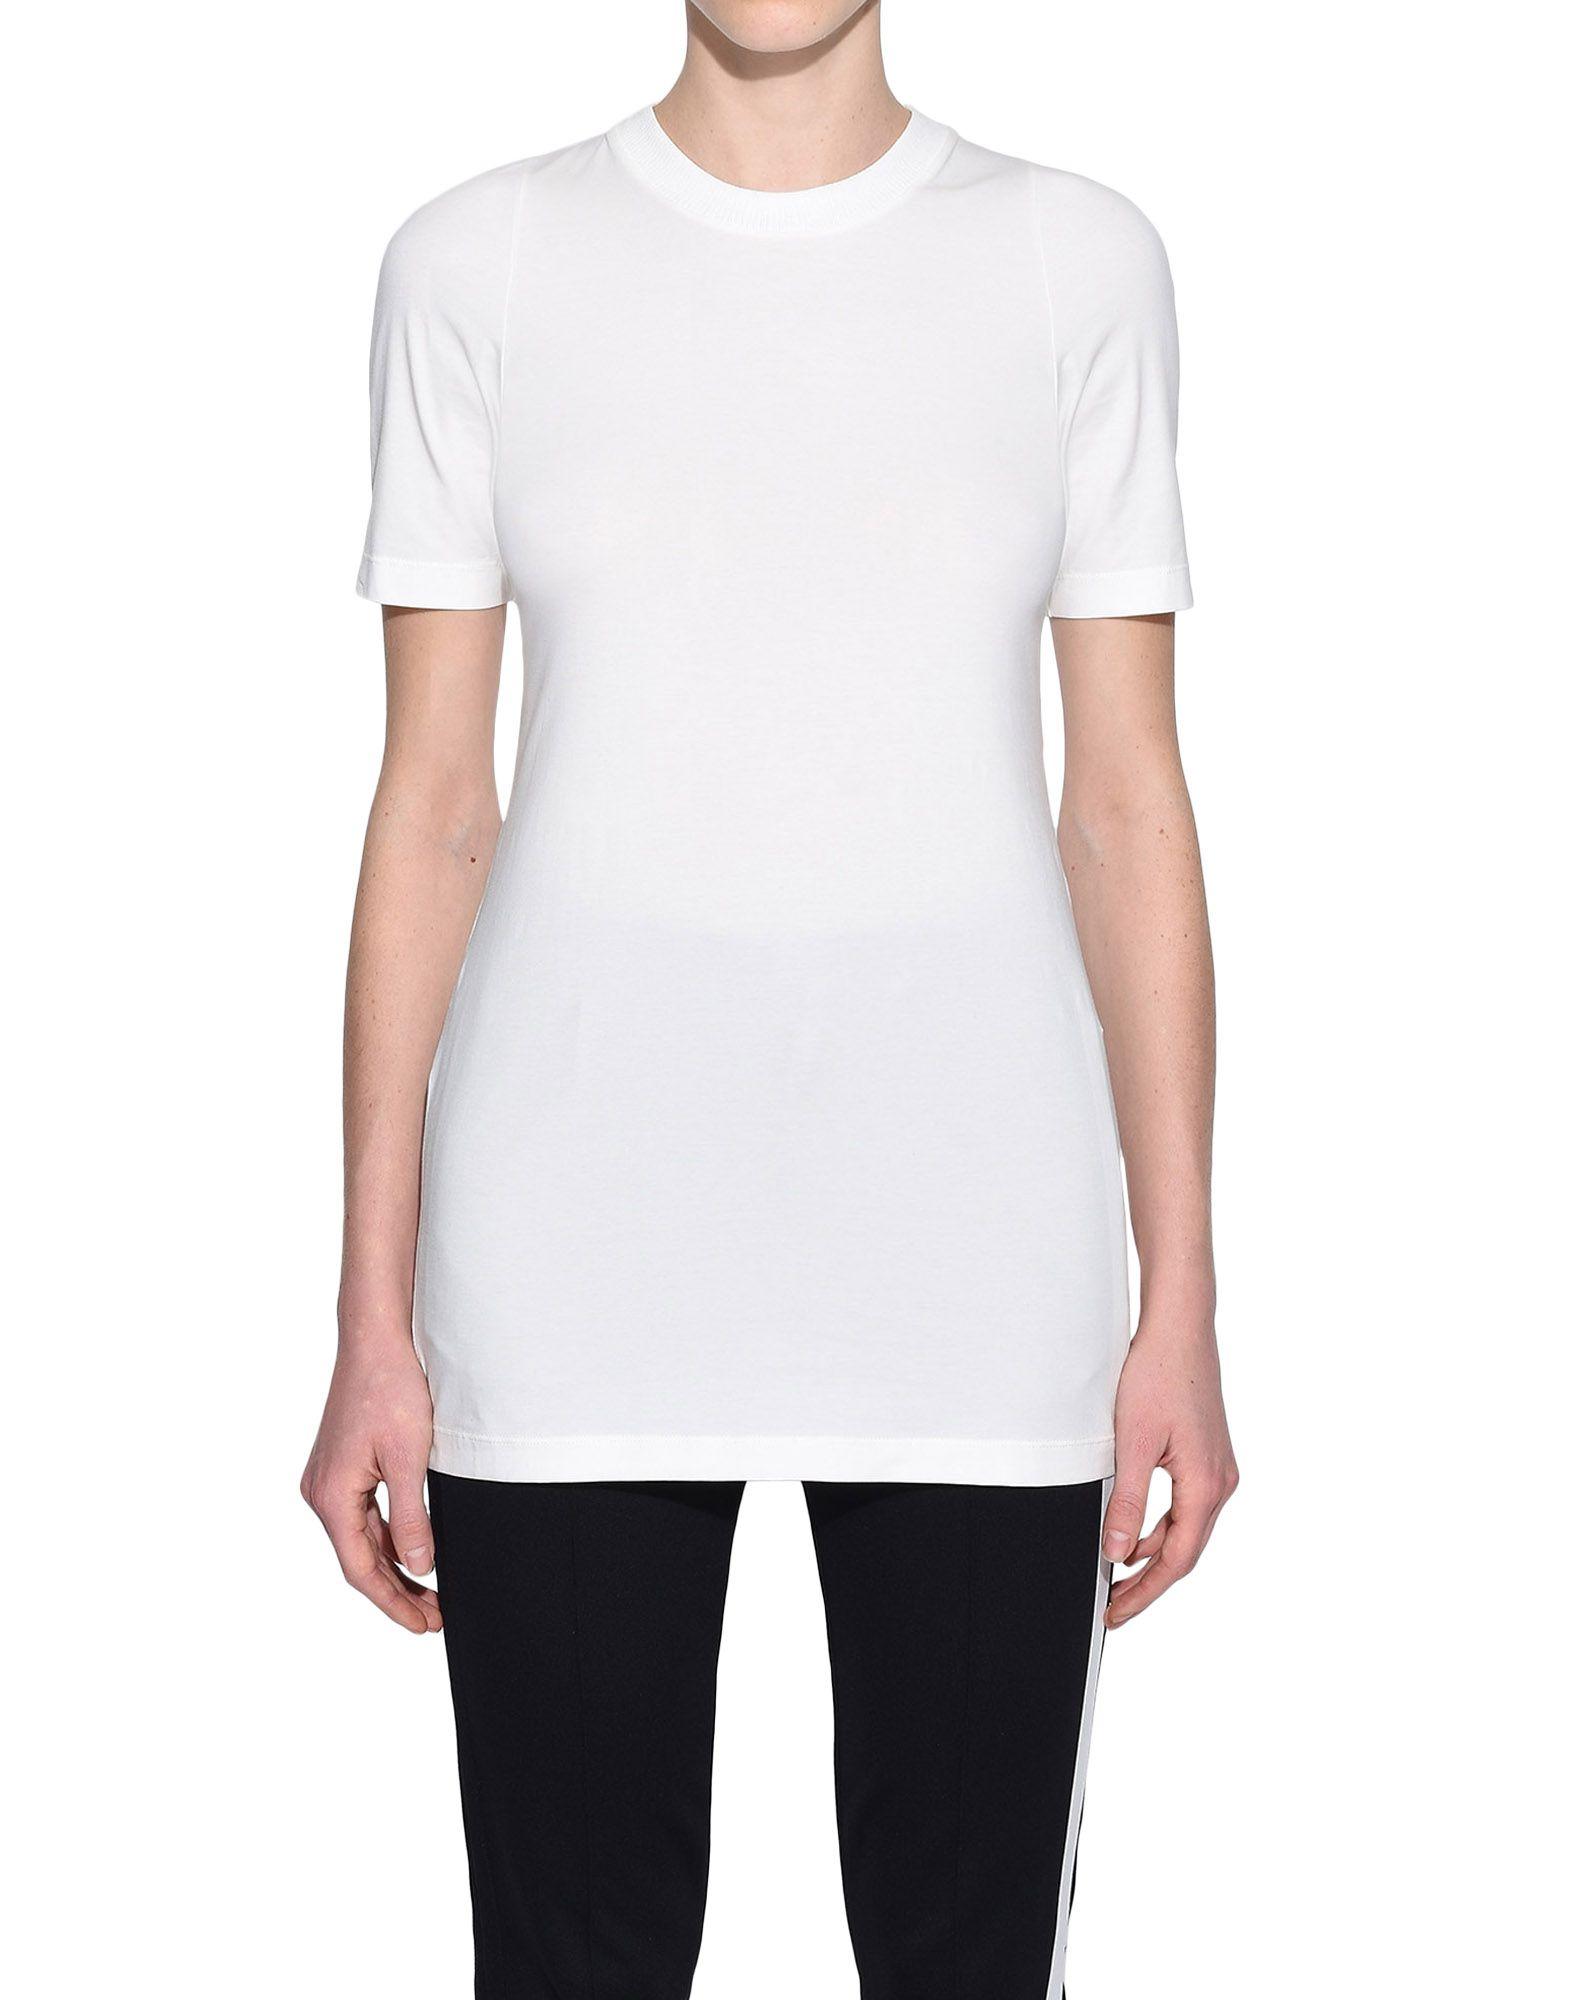 Y-3 Y-3 Prime Tee Short sleeve t-shirt Woman r